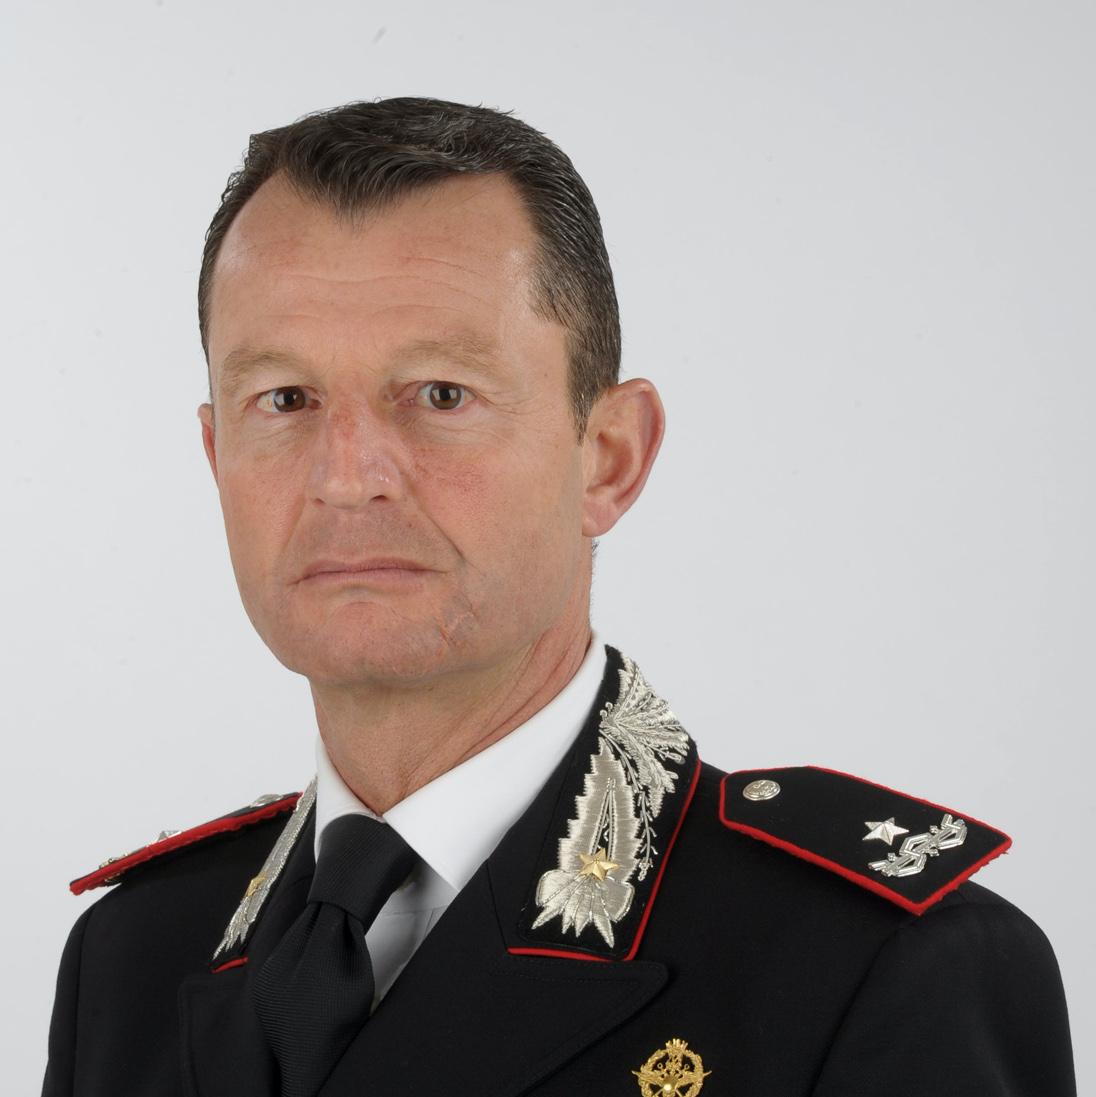 Iacopo Mannucci Benincasa